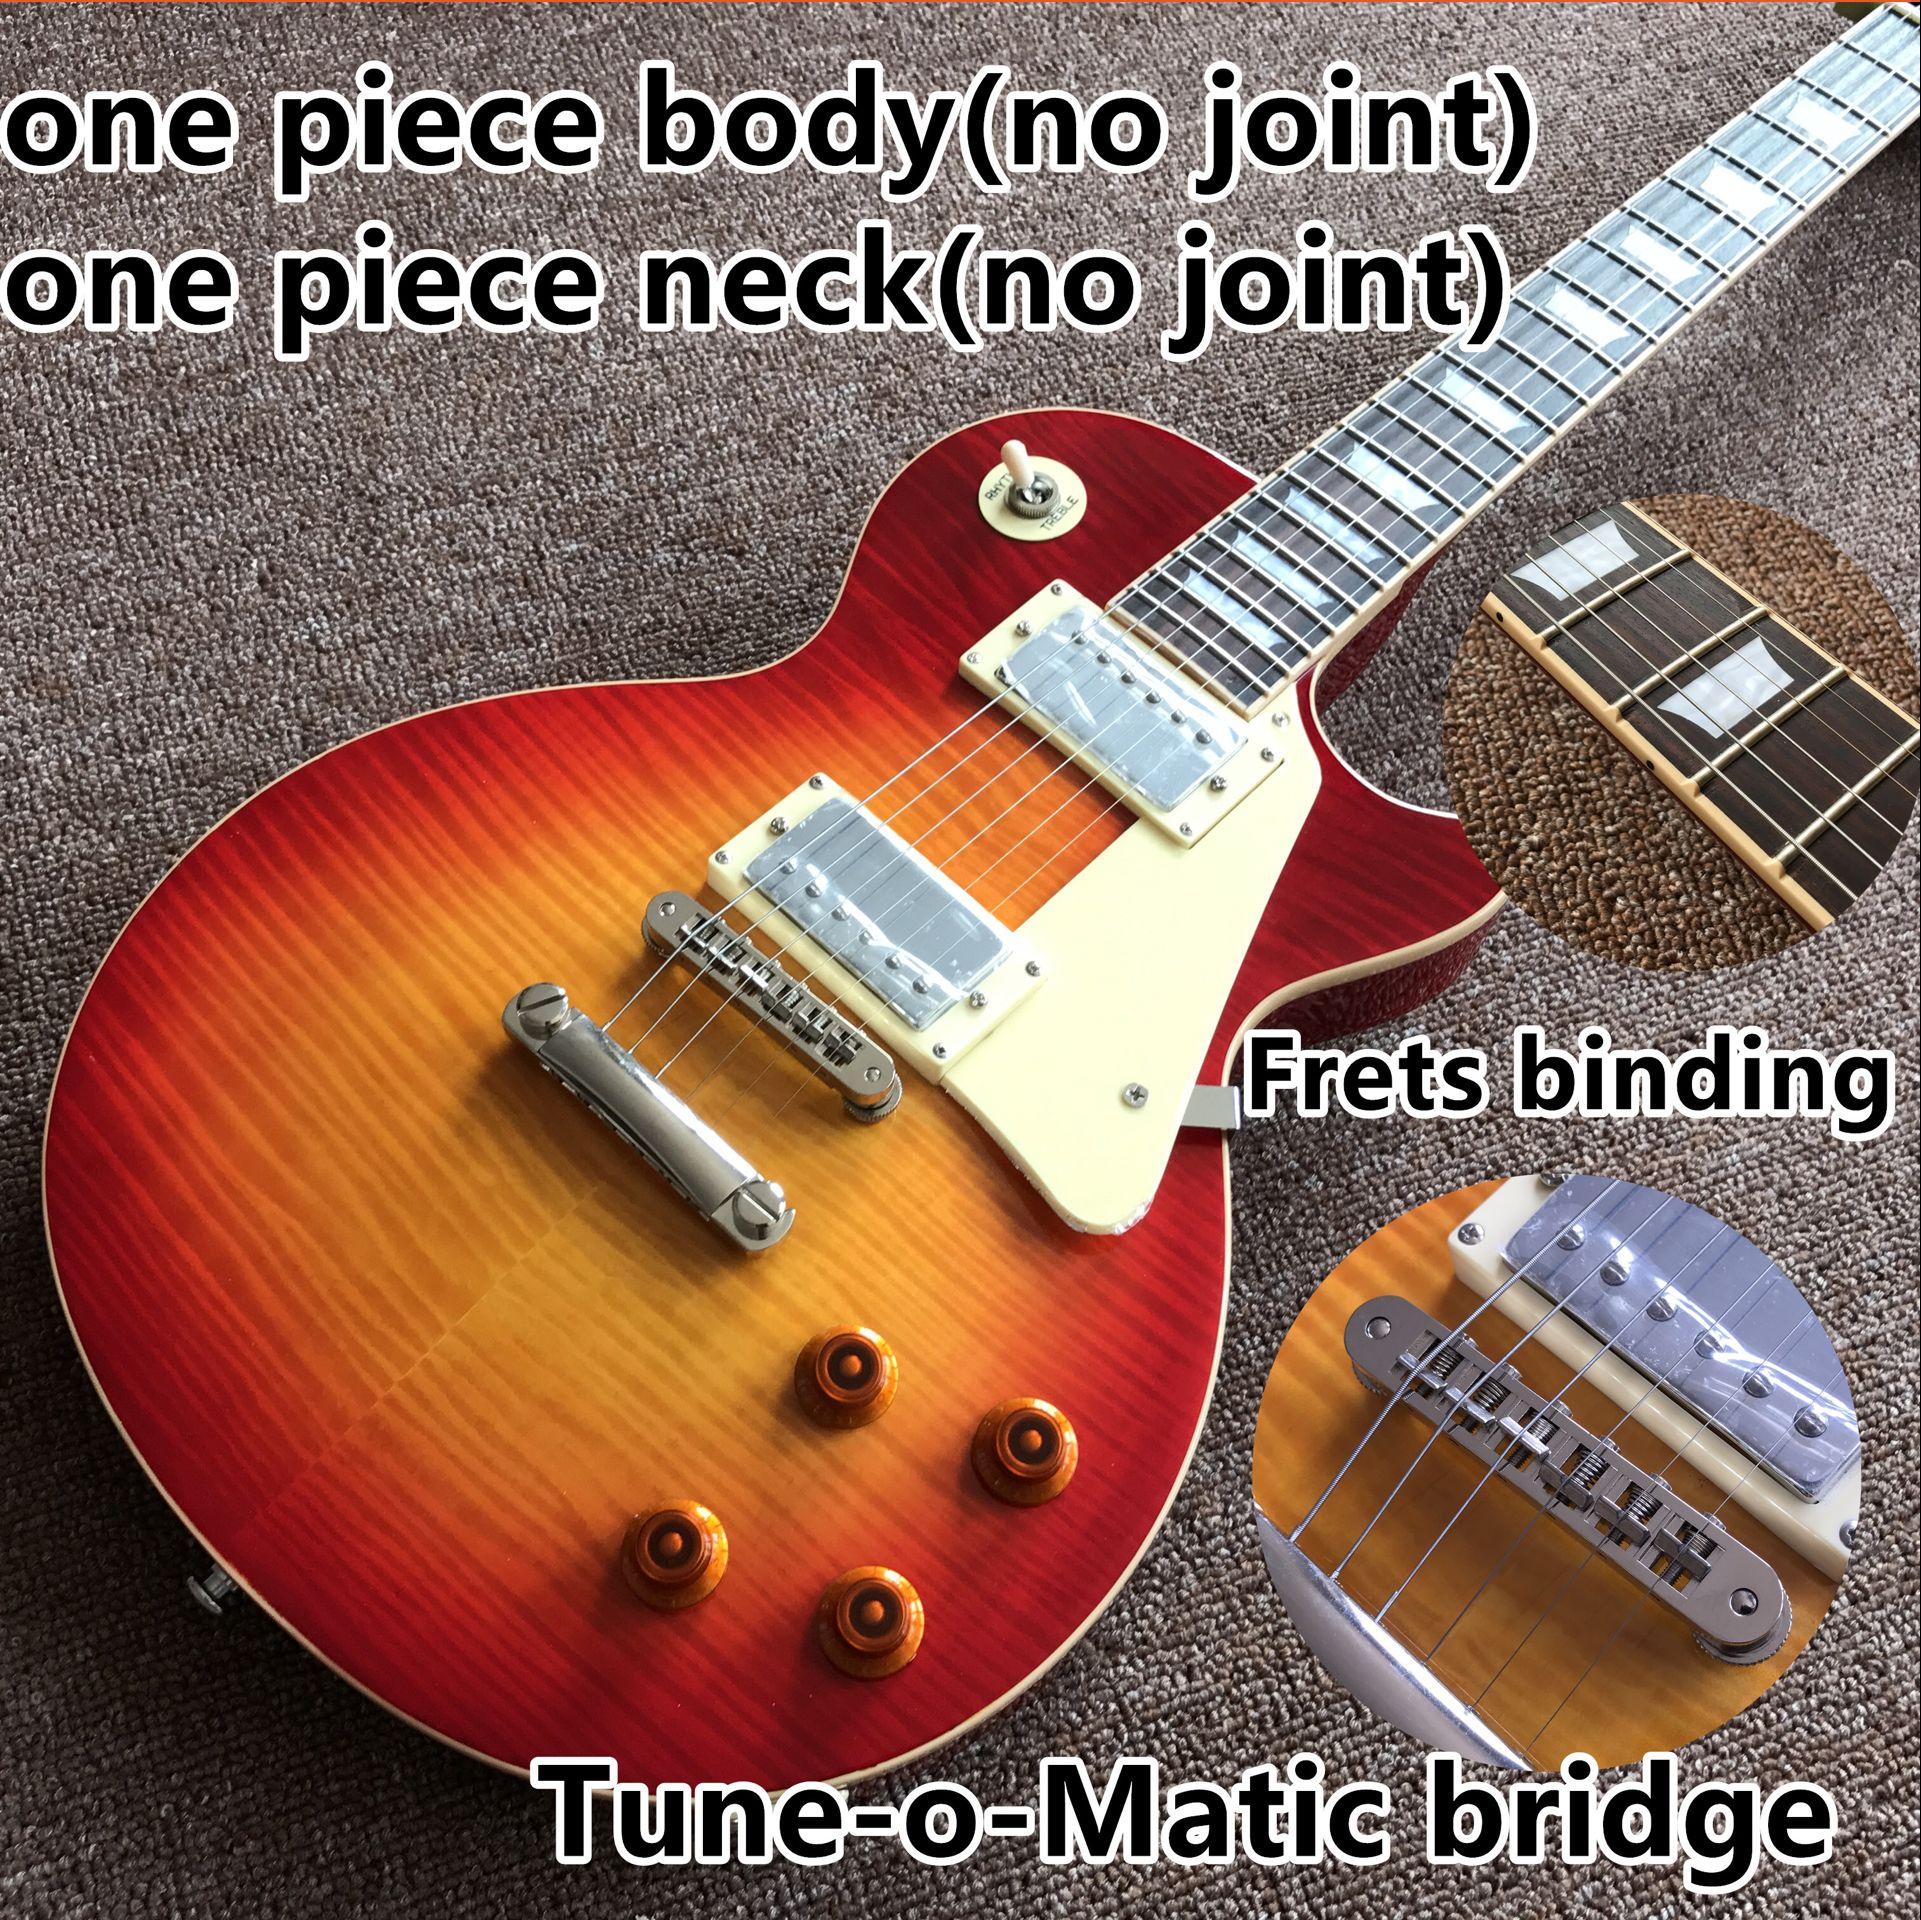 Tiger Flame Standard gitaar.one piece neck and one piece body Electric guitar..Tune-o-Matic bridge.Sunburst color guitarra